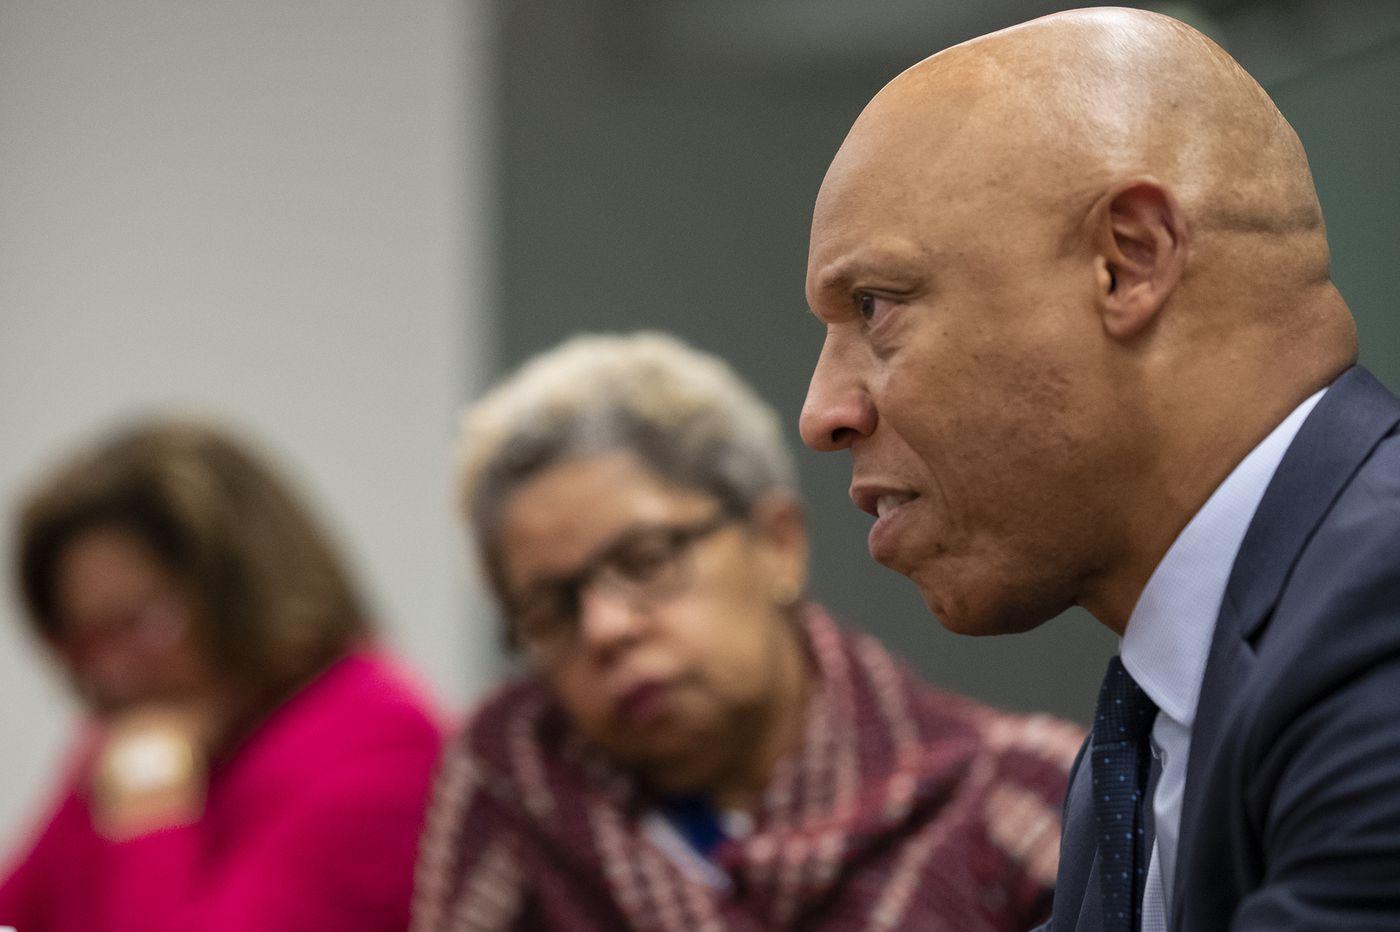 Philly school board chair: Despite missteps, we back superintendent